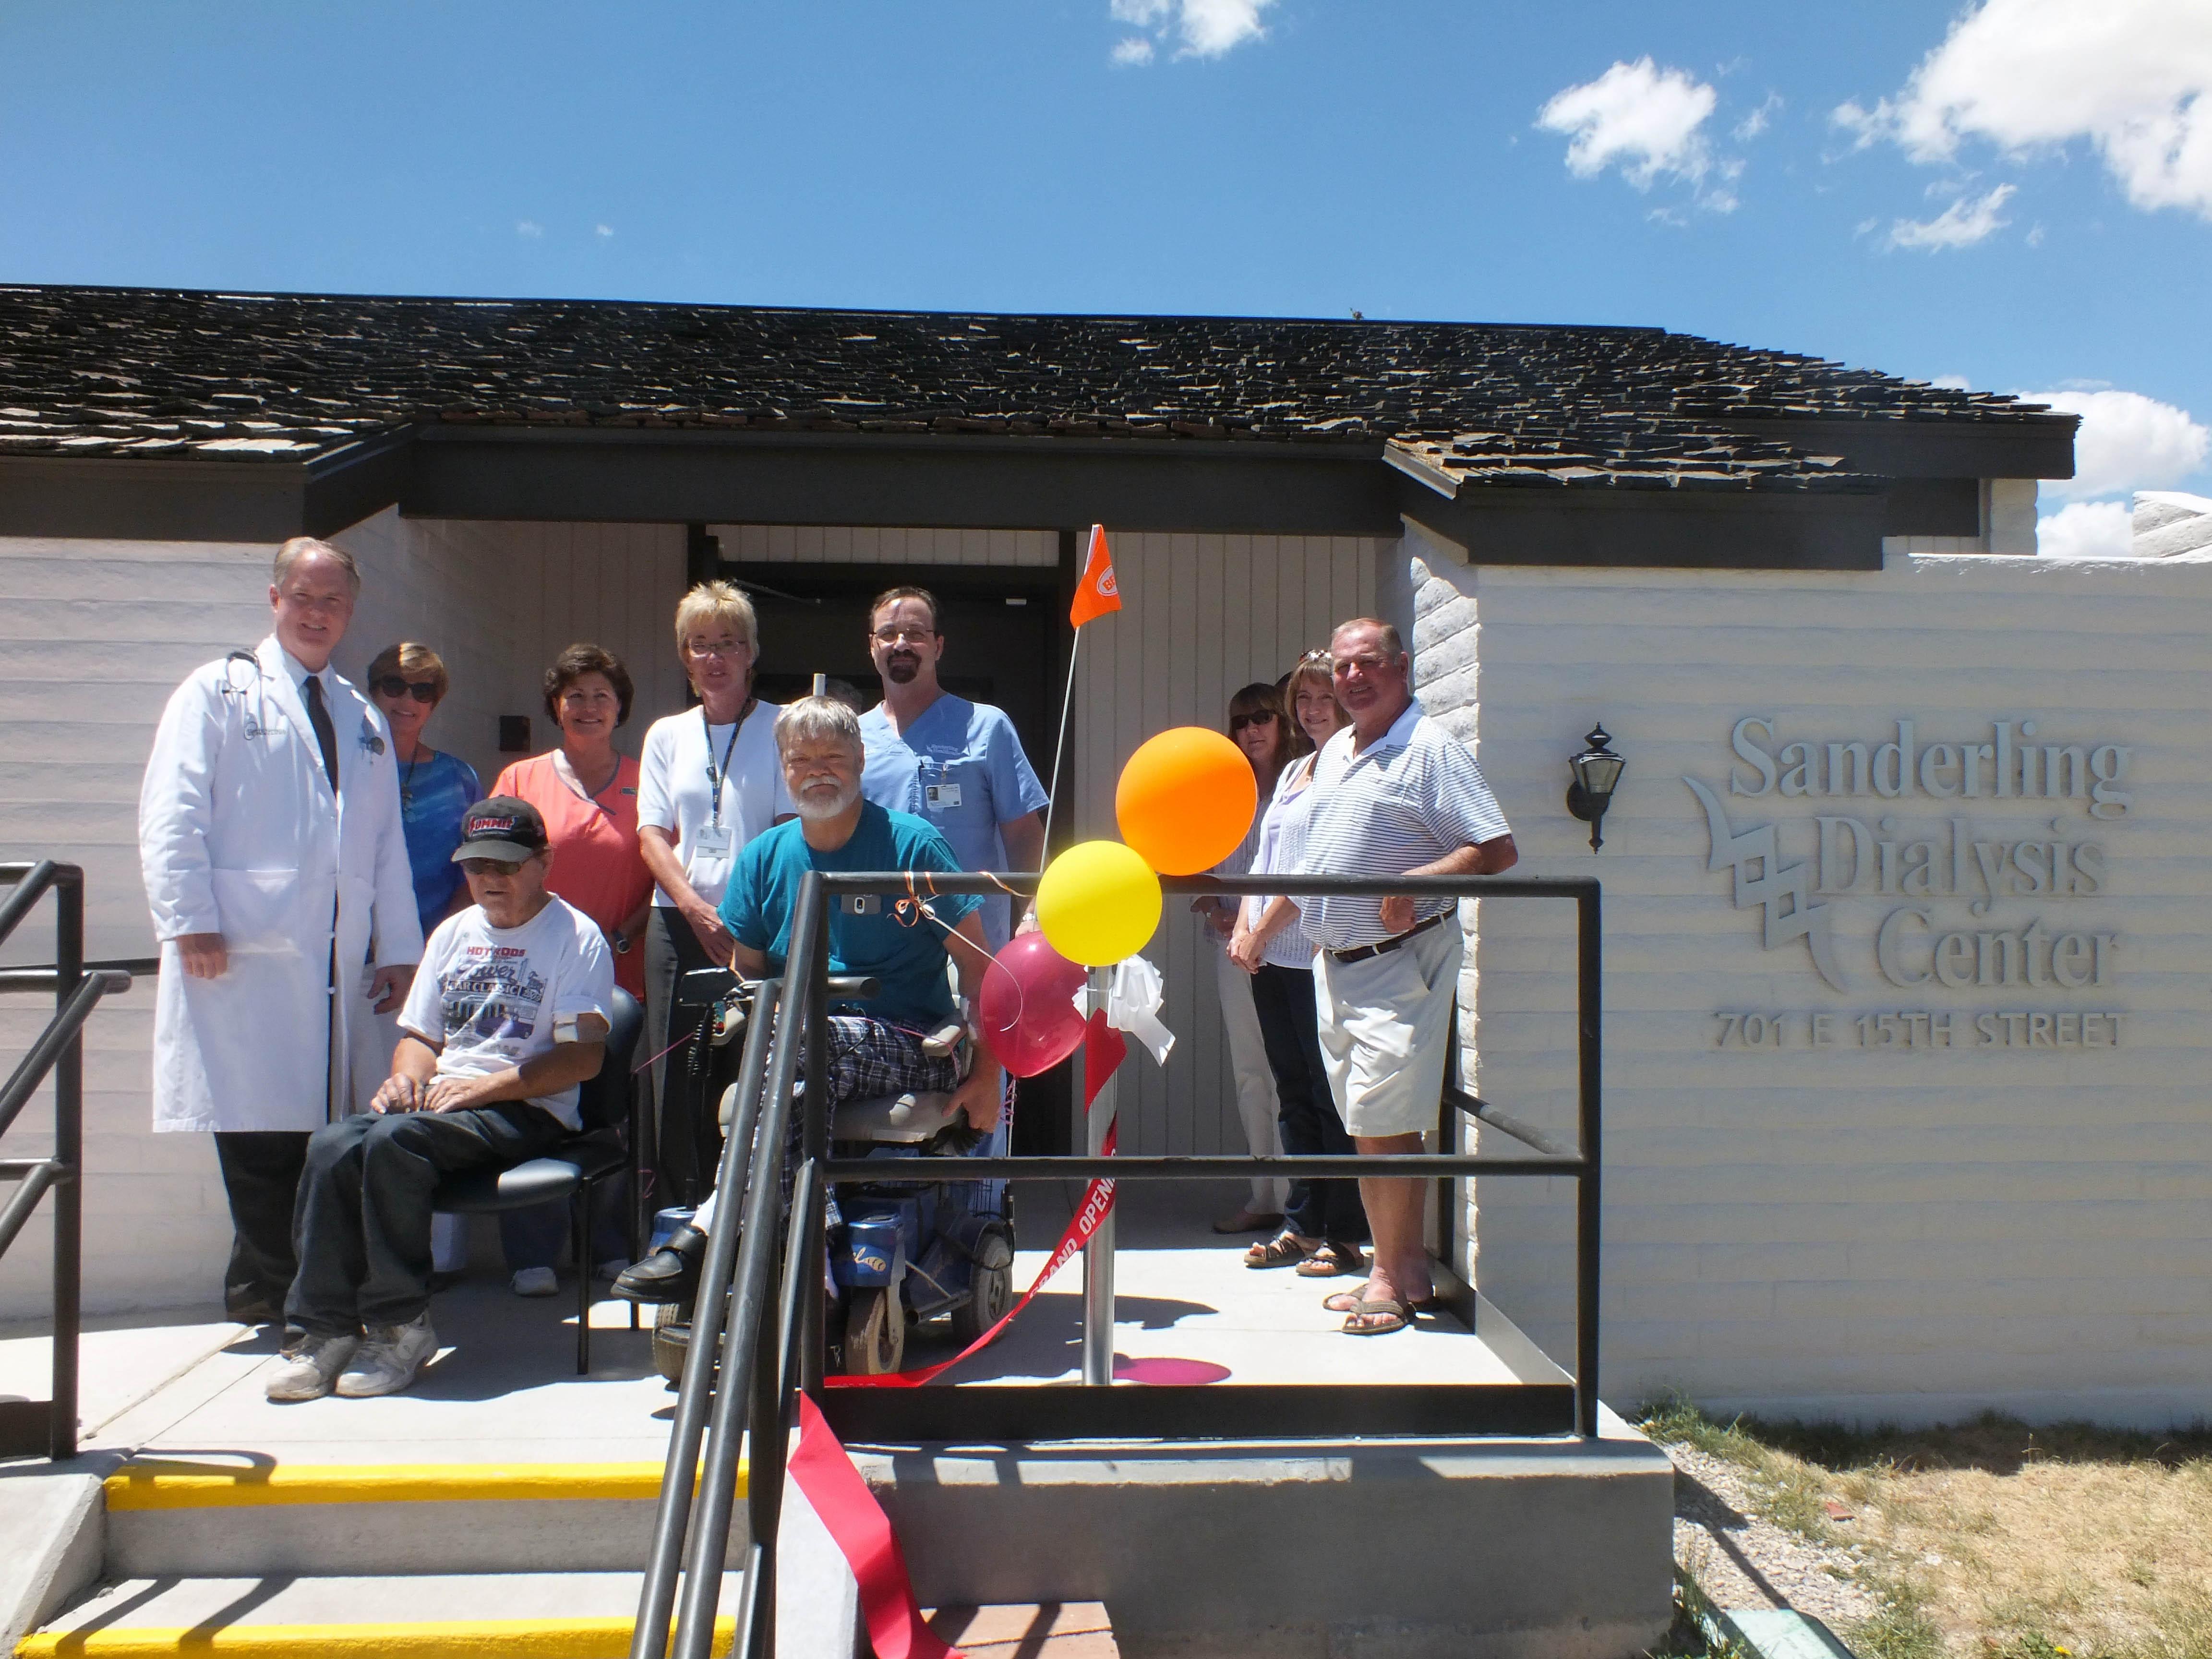 Sanderling Dialysis Center opens in Ely